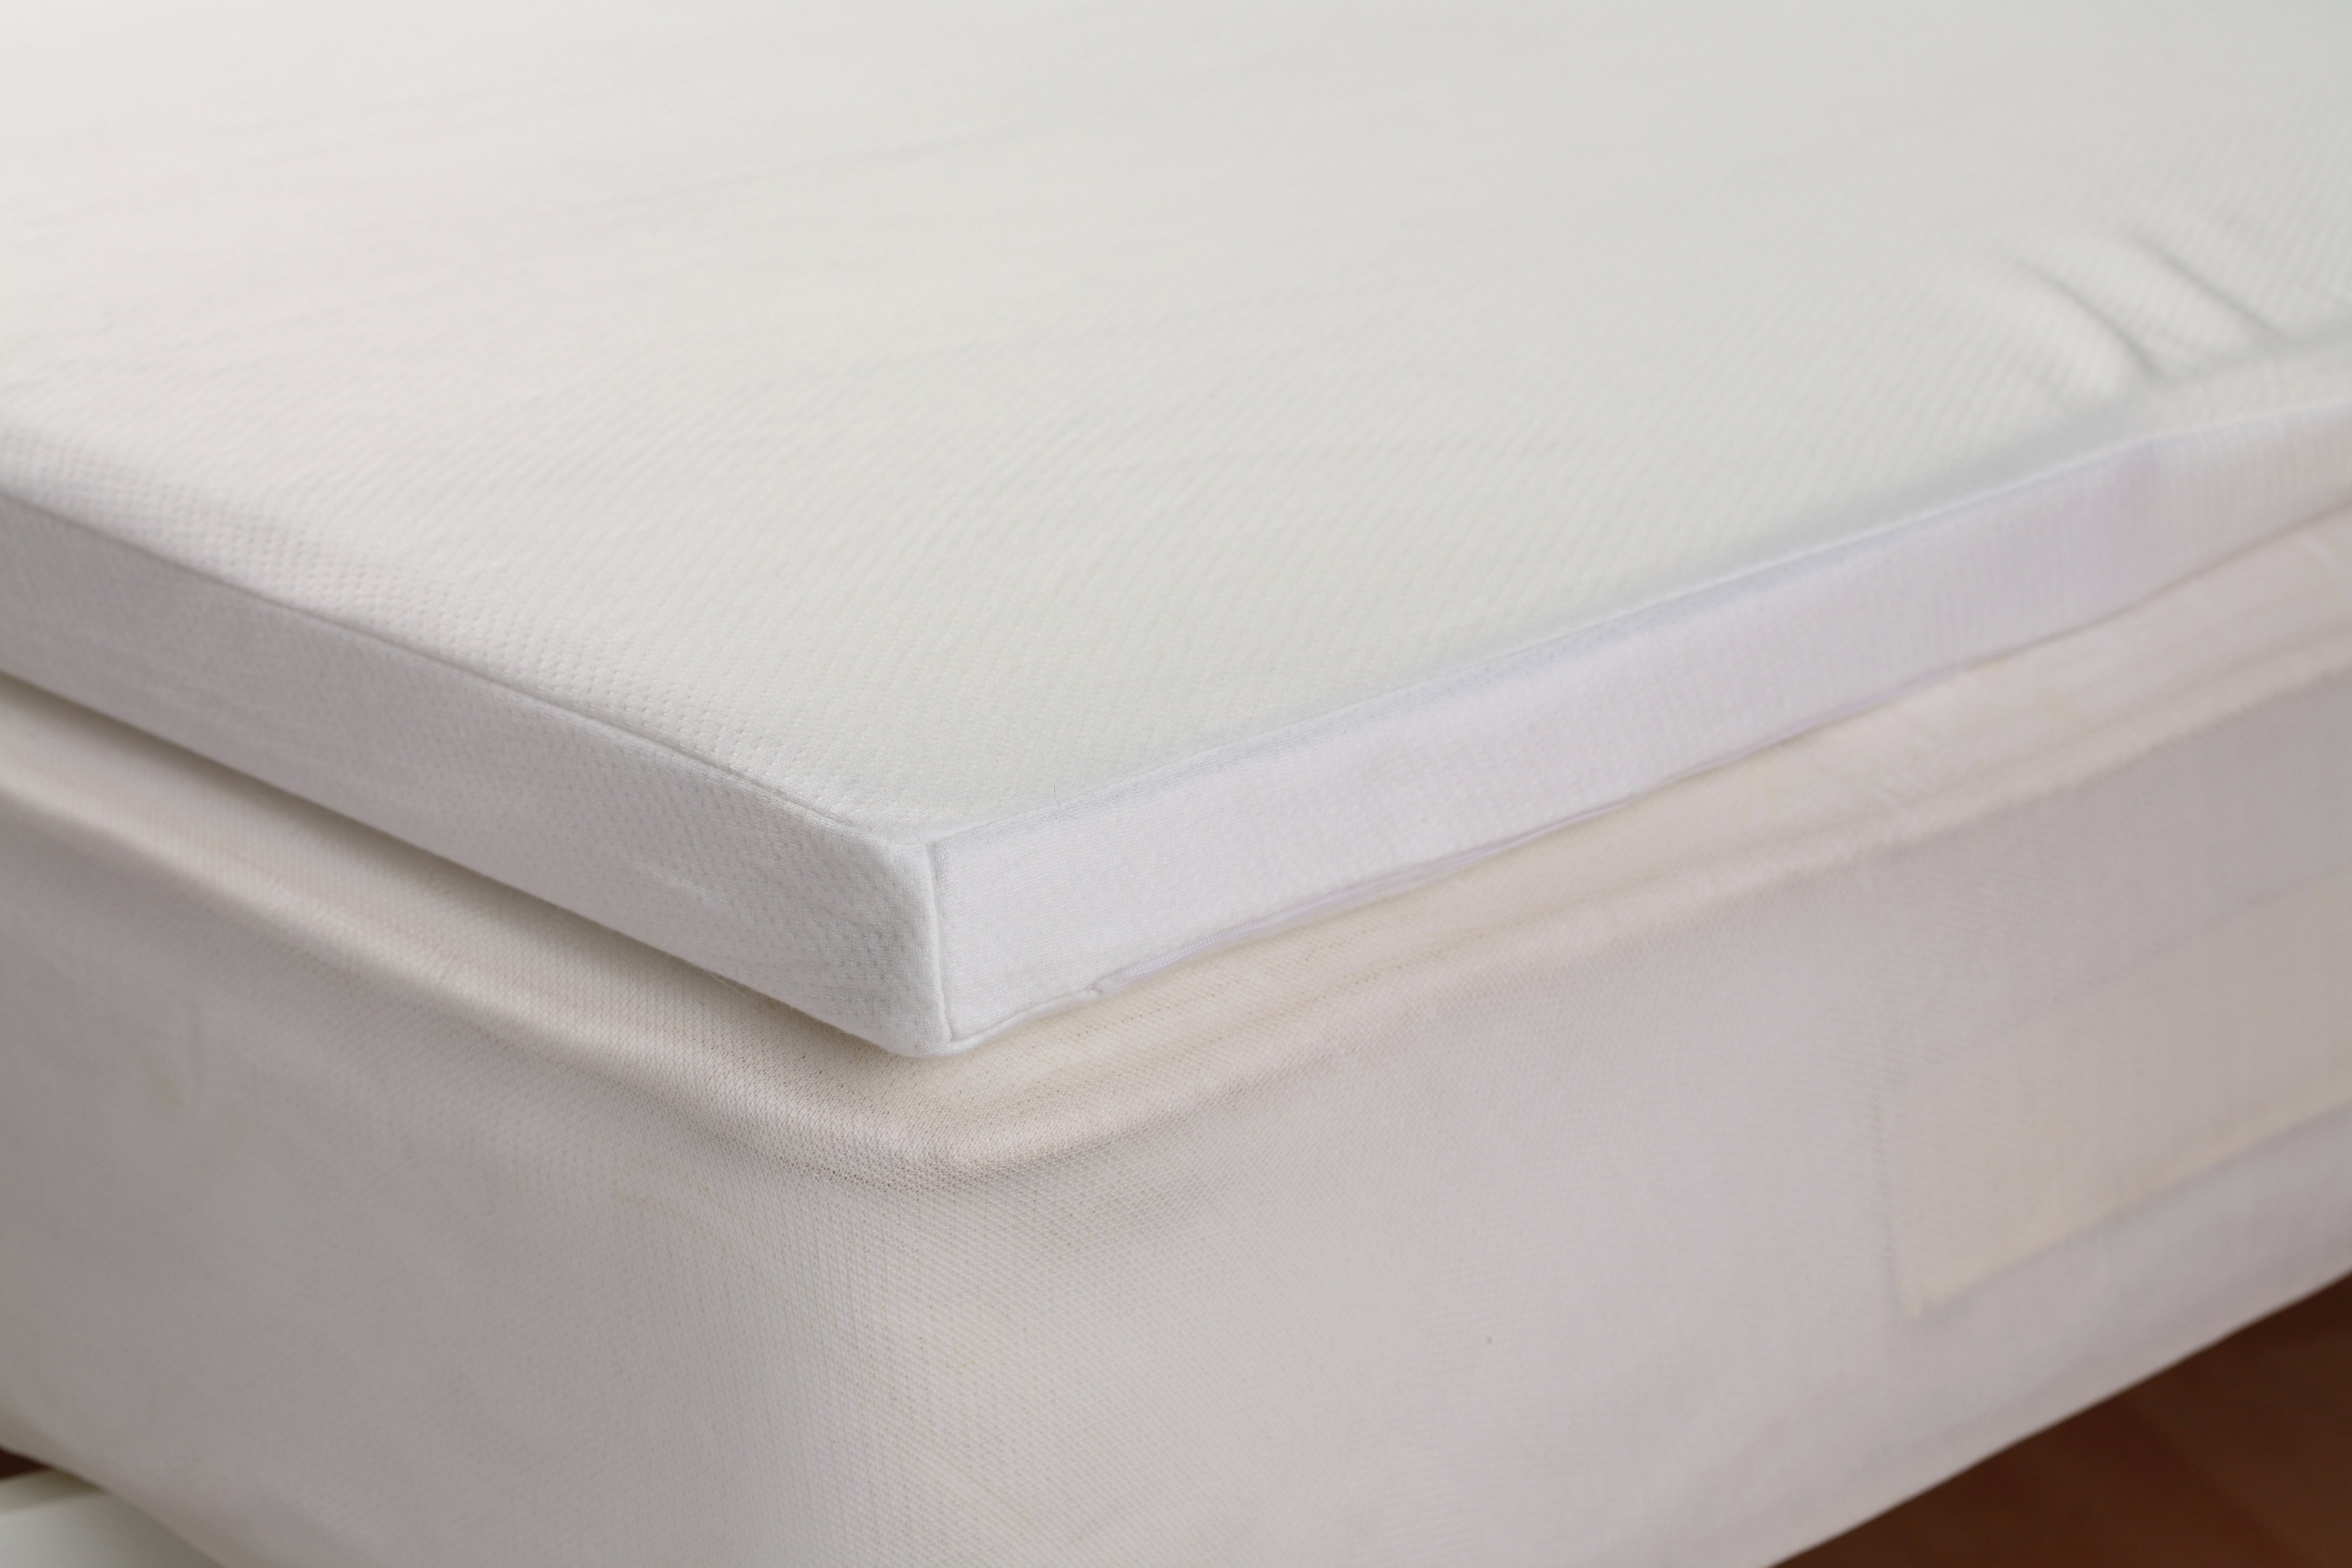 downland 2 memory foam topper single mattress the. Black Bedroom Furniture Sets. Home Design Ideas